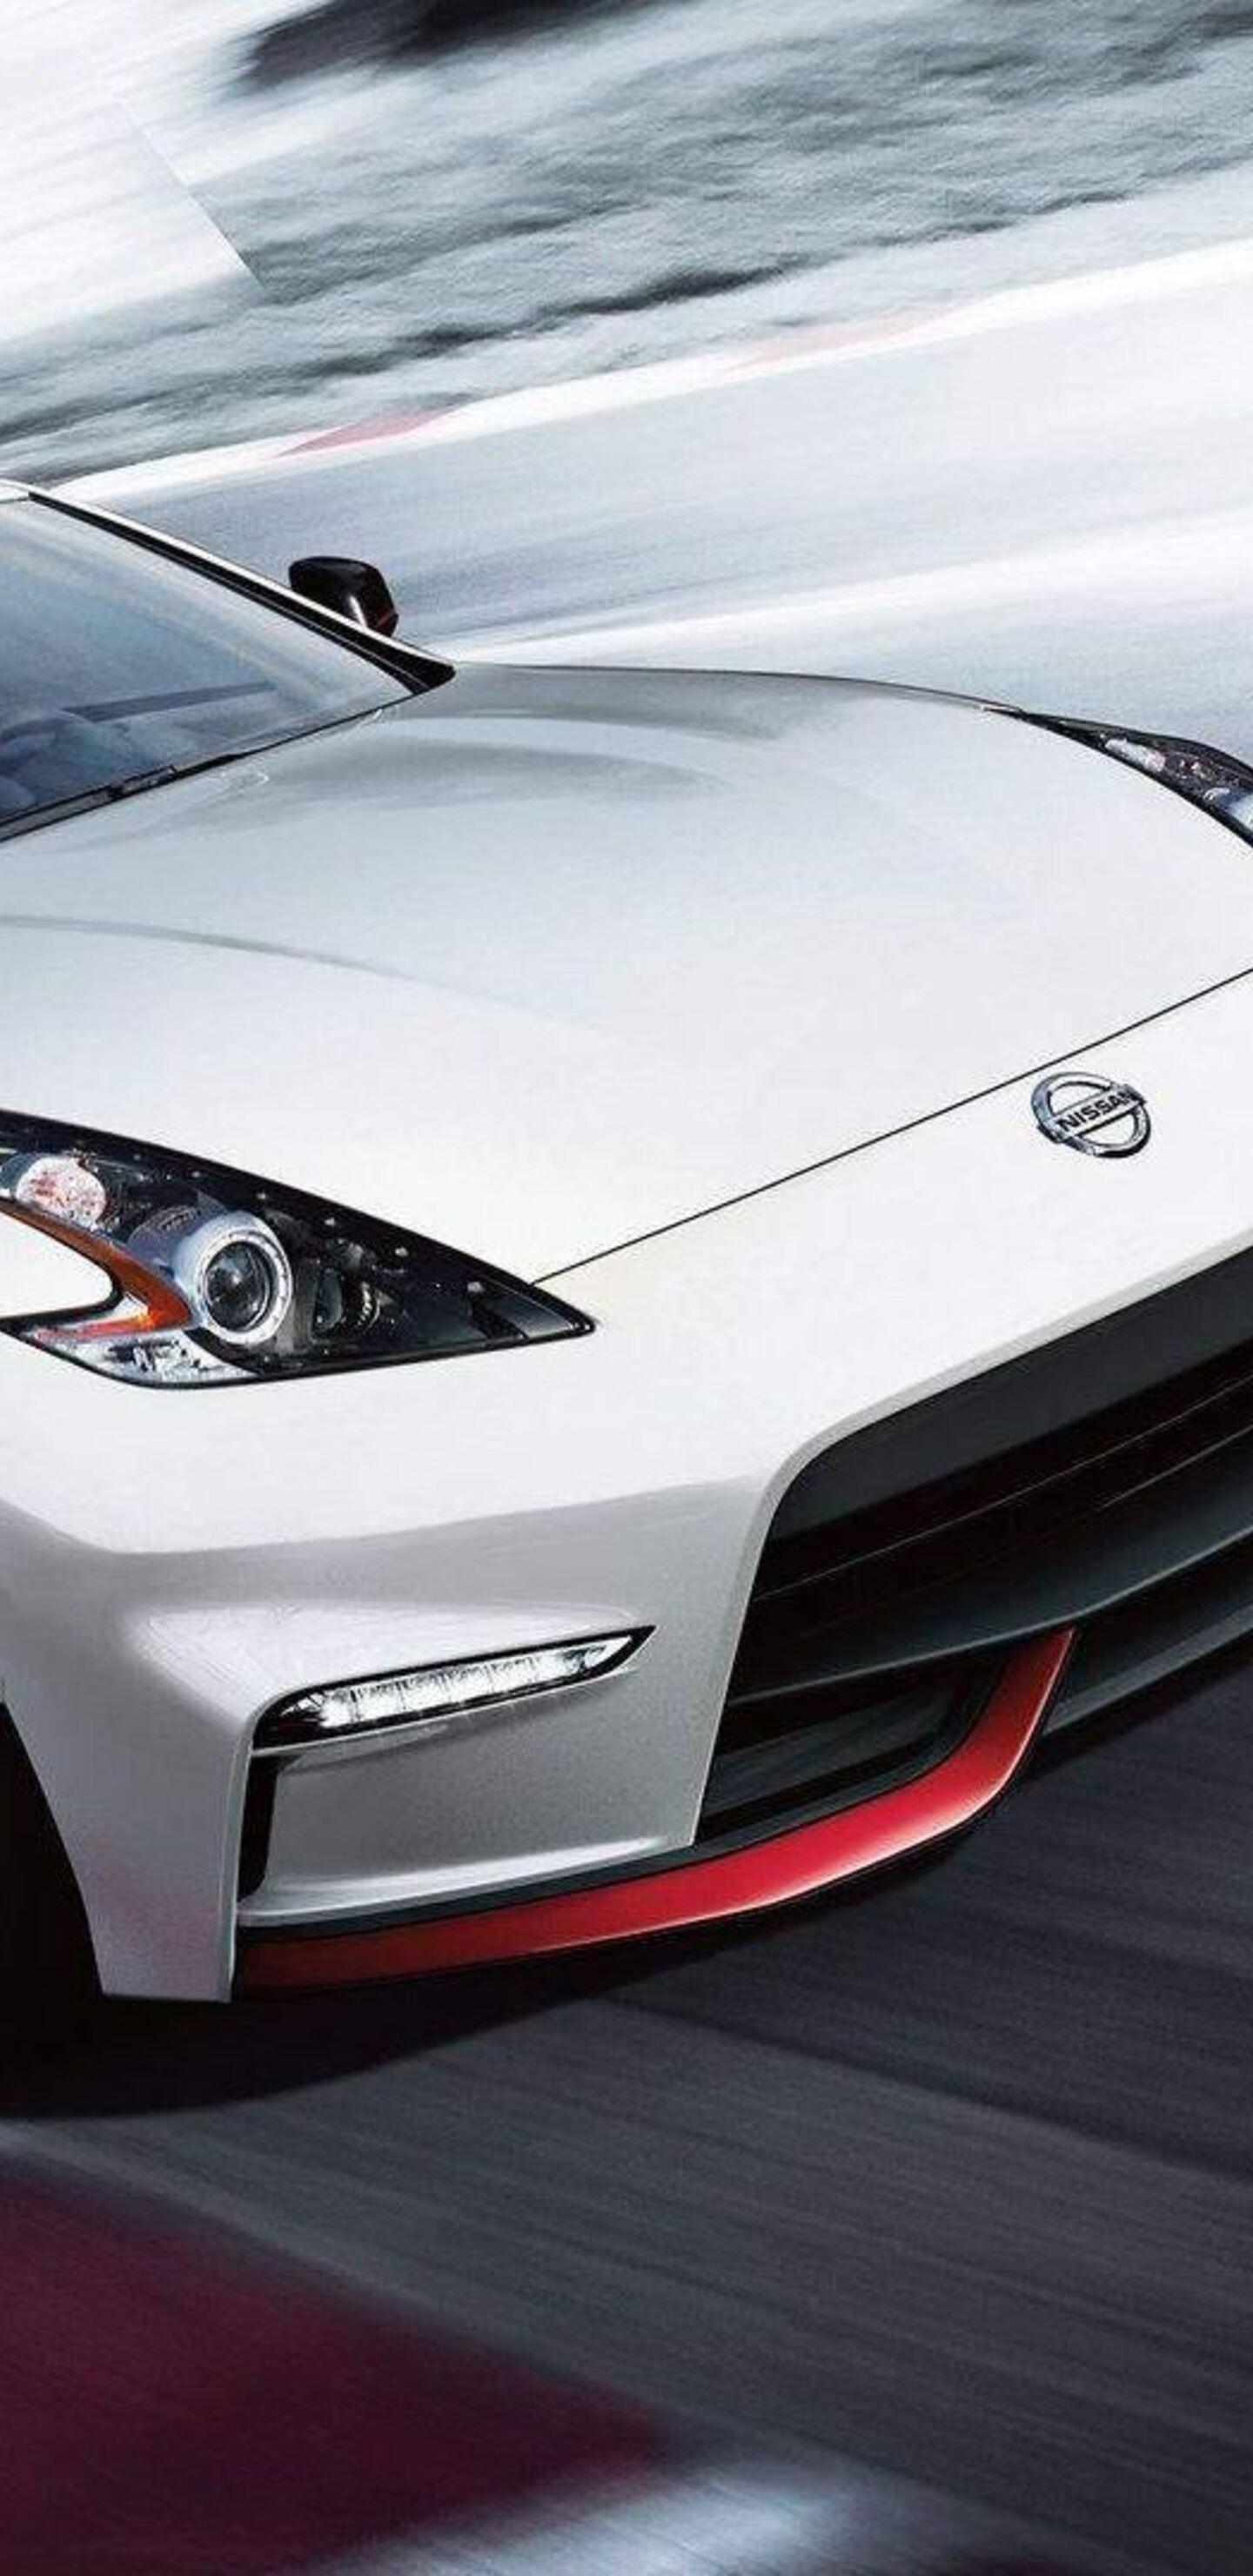 Nissan 370z 2016 Image